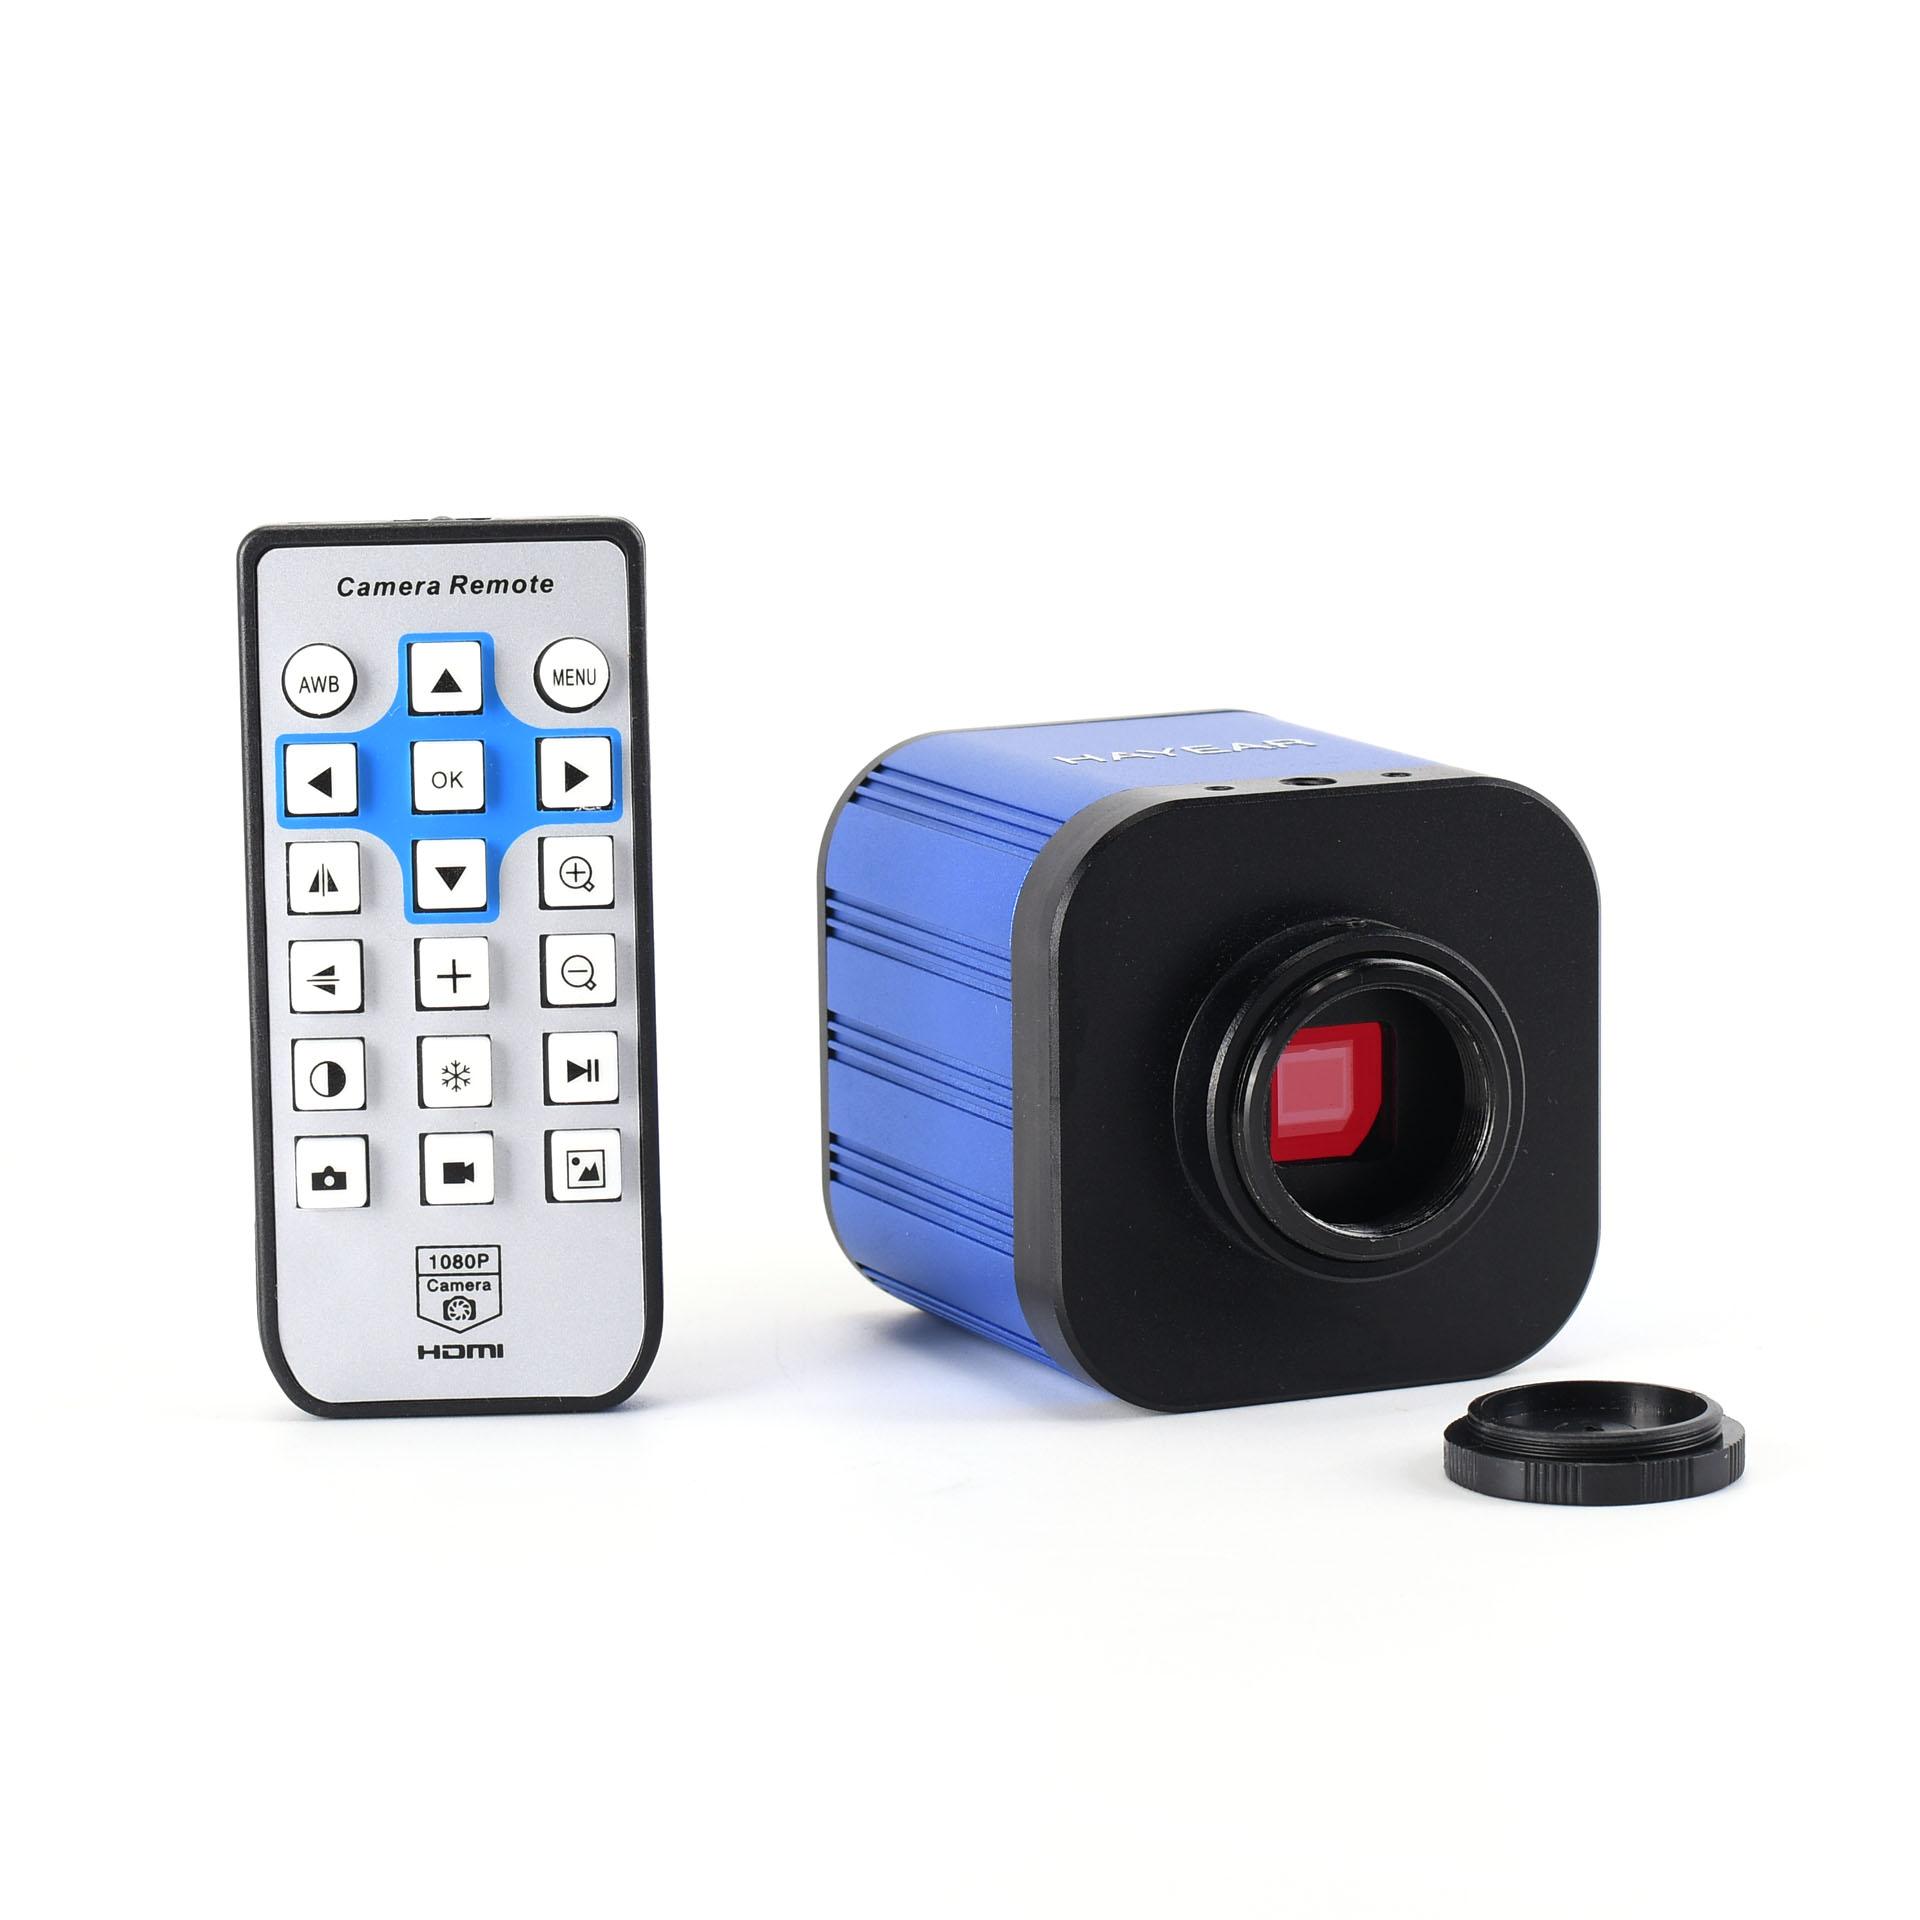 New 4K Digital Microscope Camera 2160P 1080P Industrial Video Microscope UHD Sony Sensor for PCB CPU Phone Repair Soldering